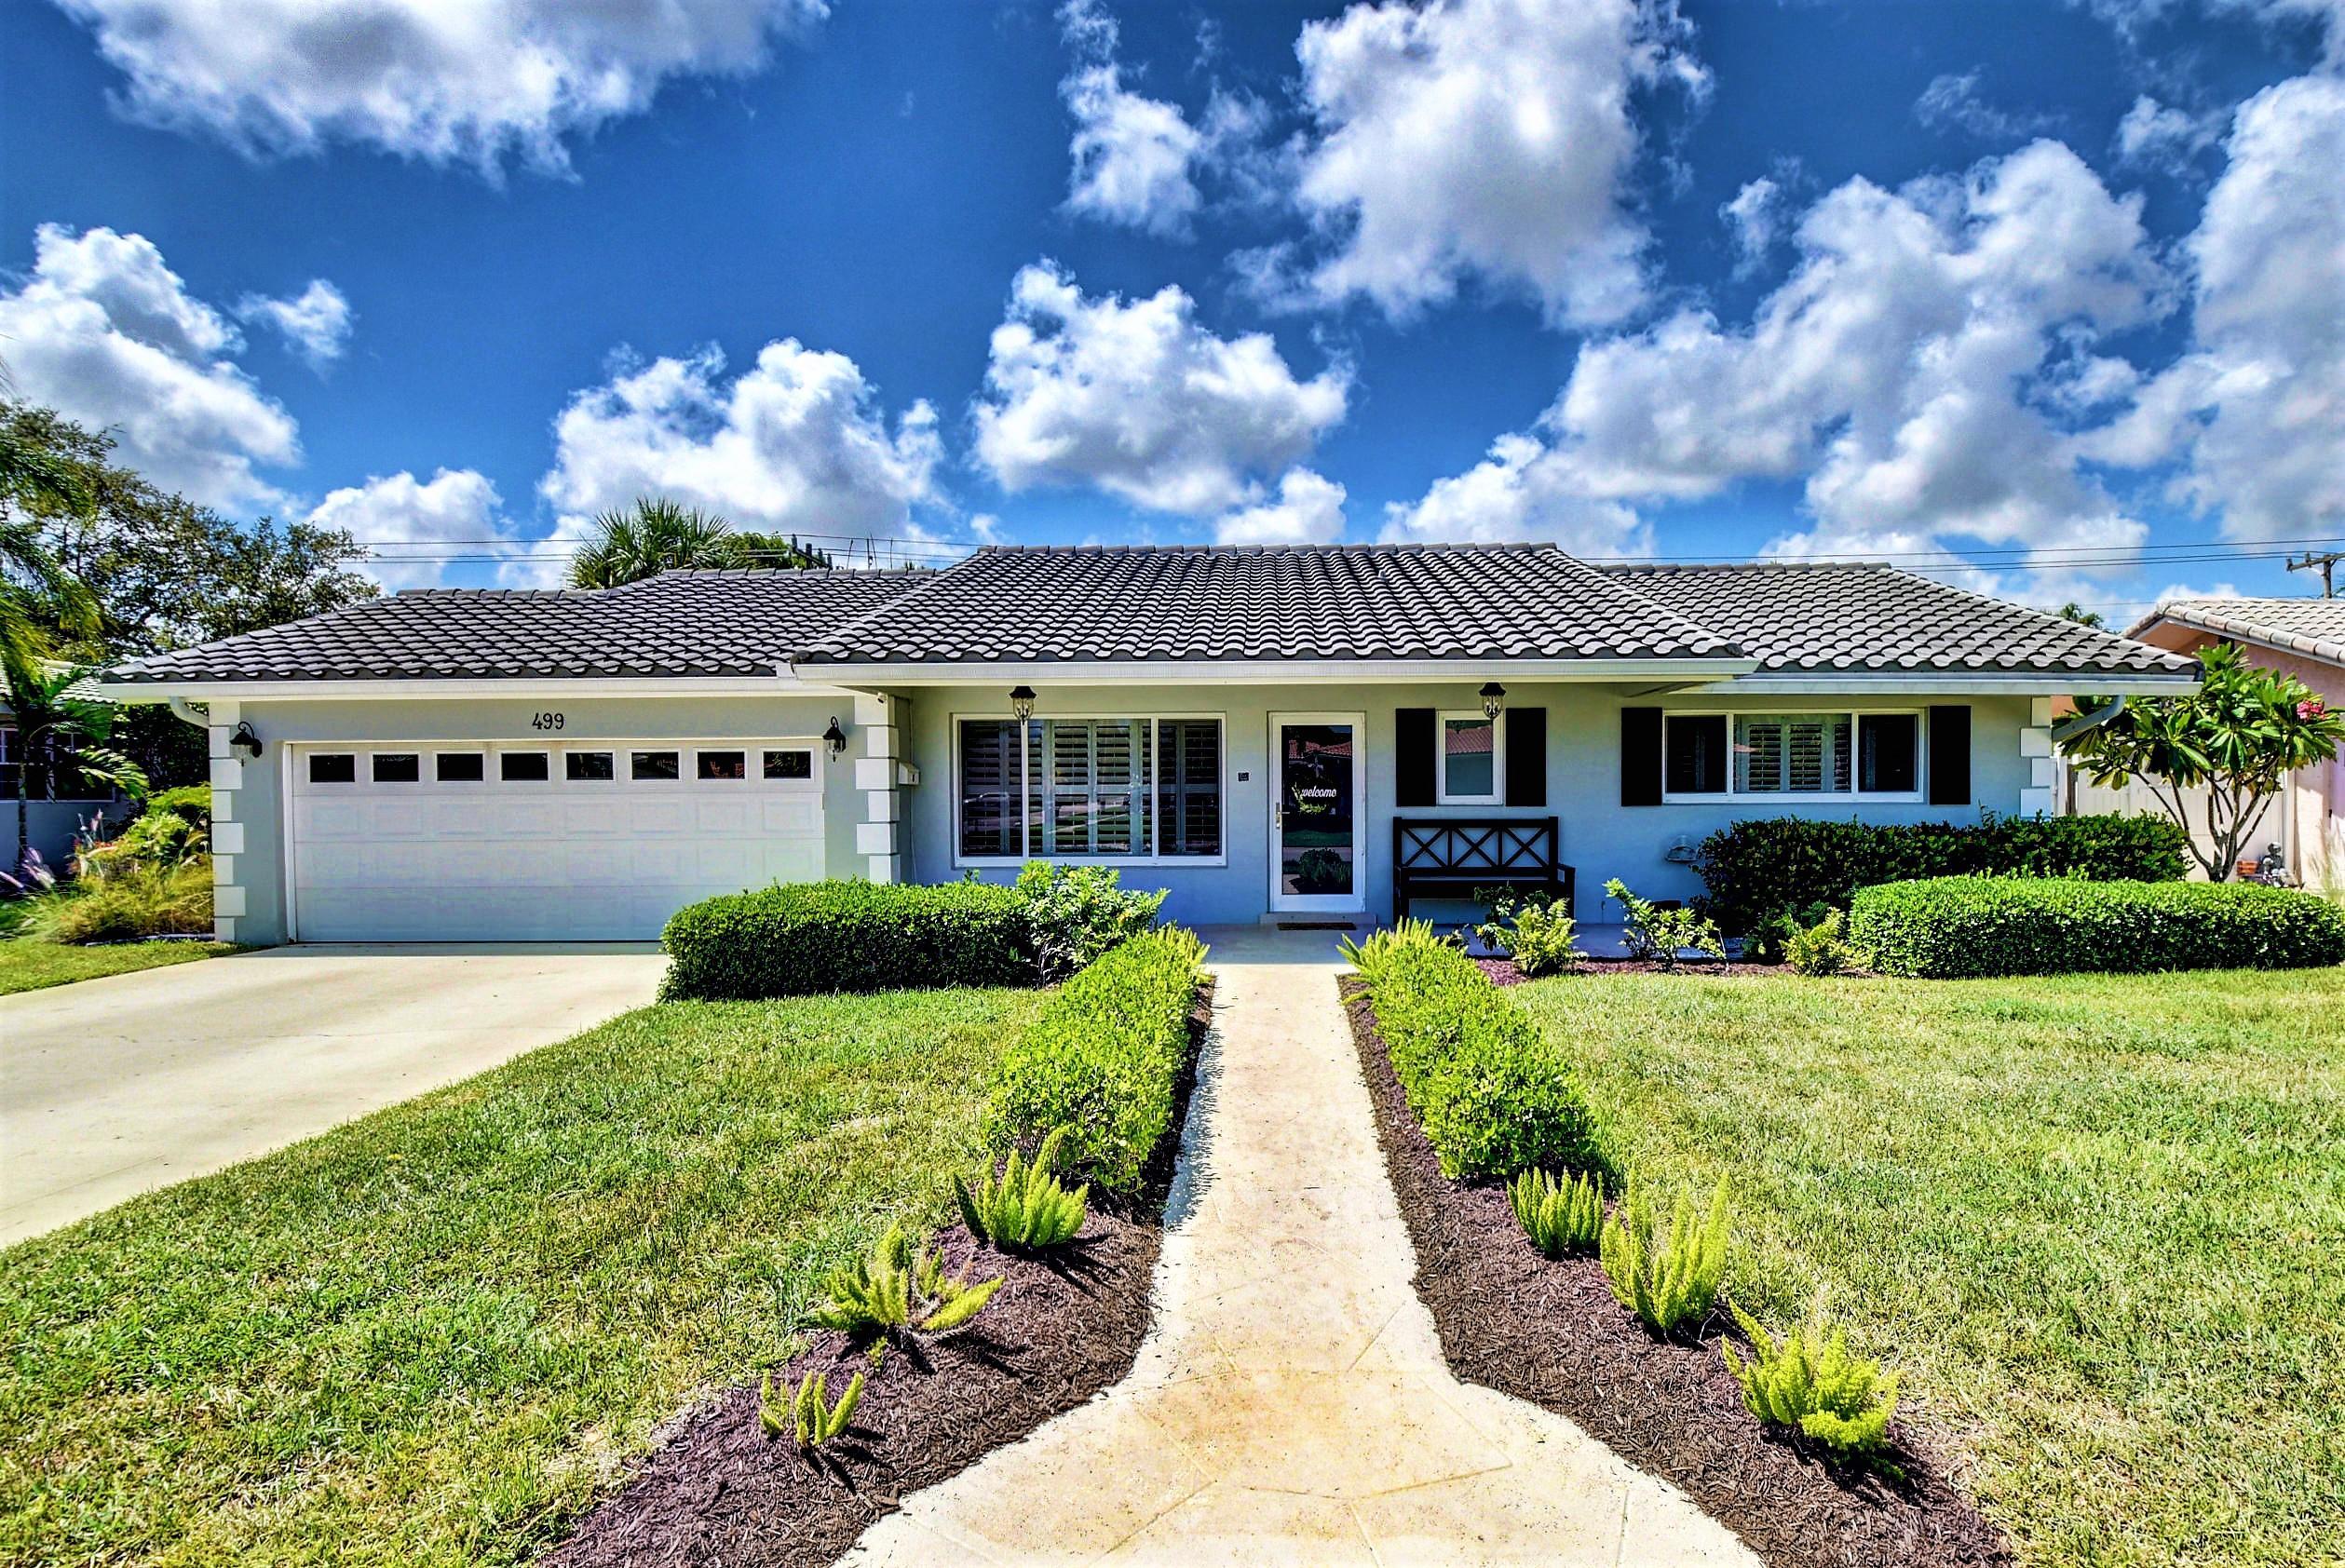 499 Sw 8th Terrace, Boca Raton, FL 33486